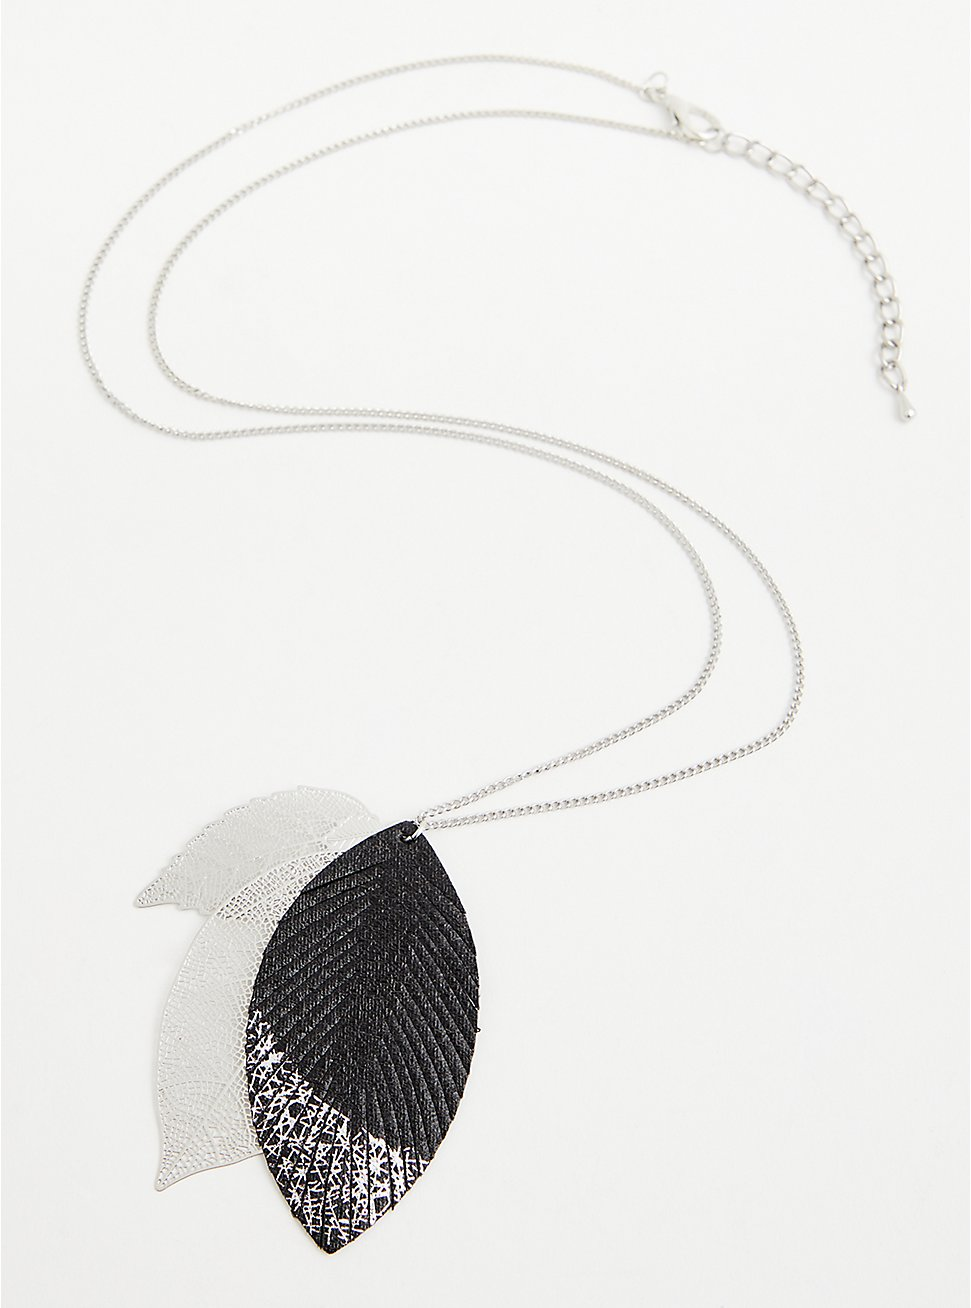 Silver-Tone Foil Dipped Leaf Pendant Necklace, , hi-res